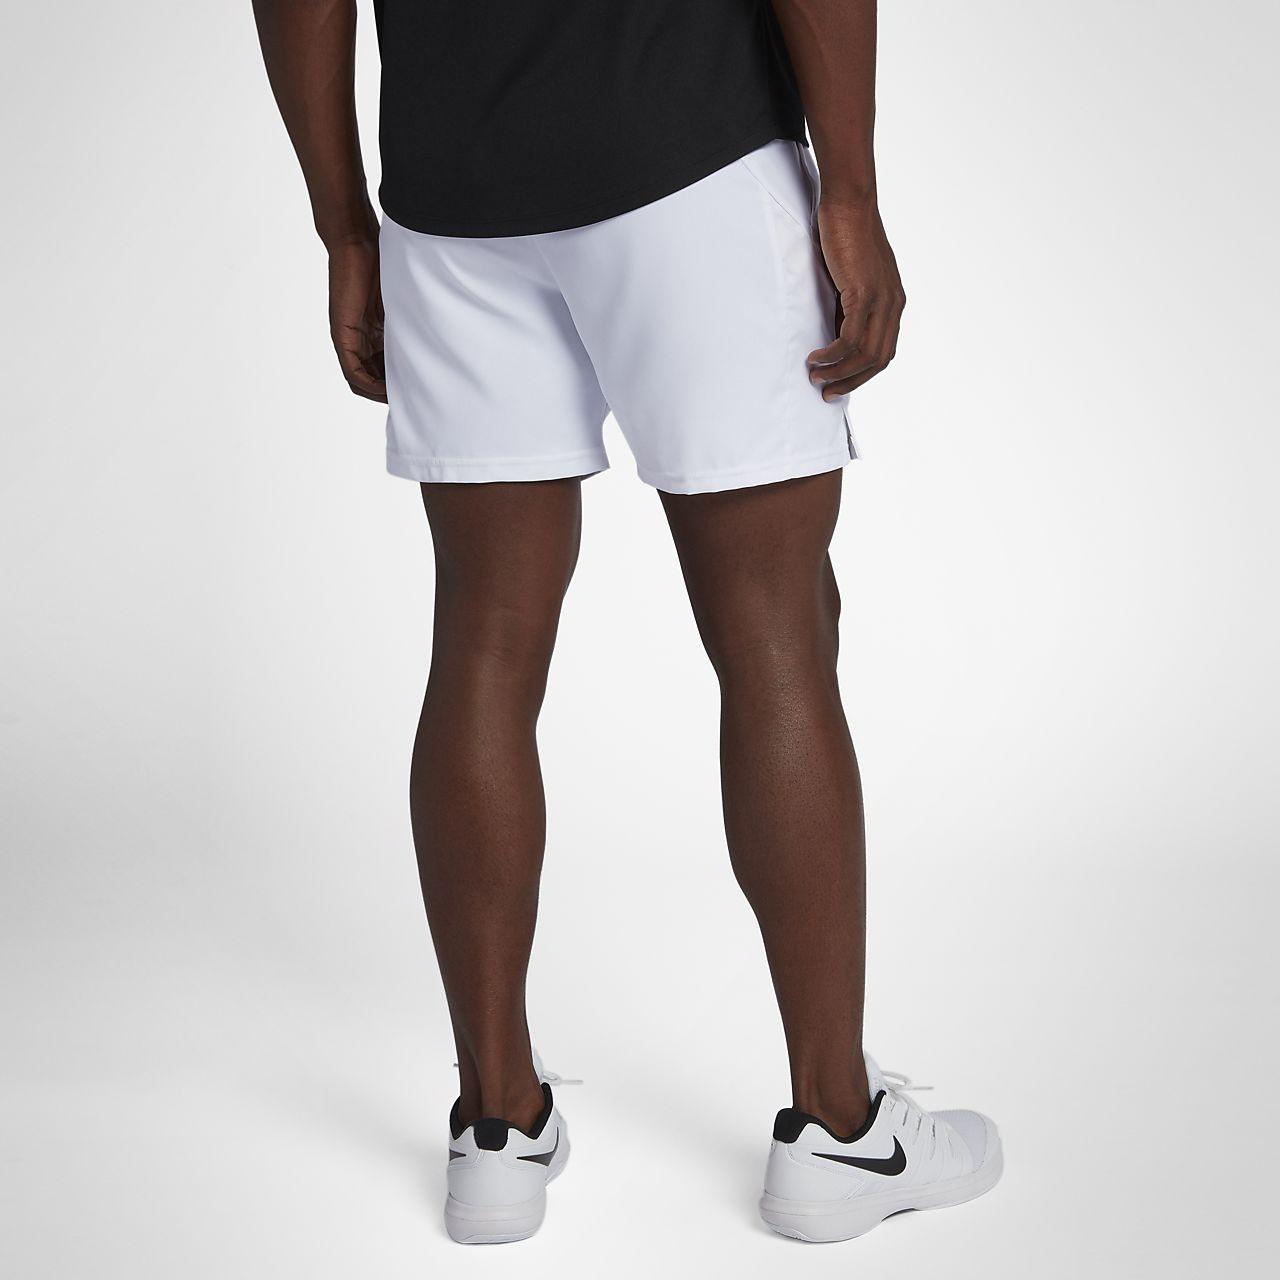 faf1546c0a0b NikeCourt Dri-FIT Men s 7